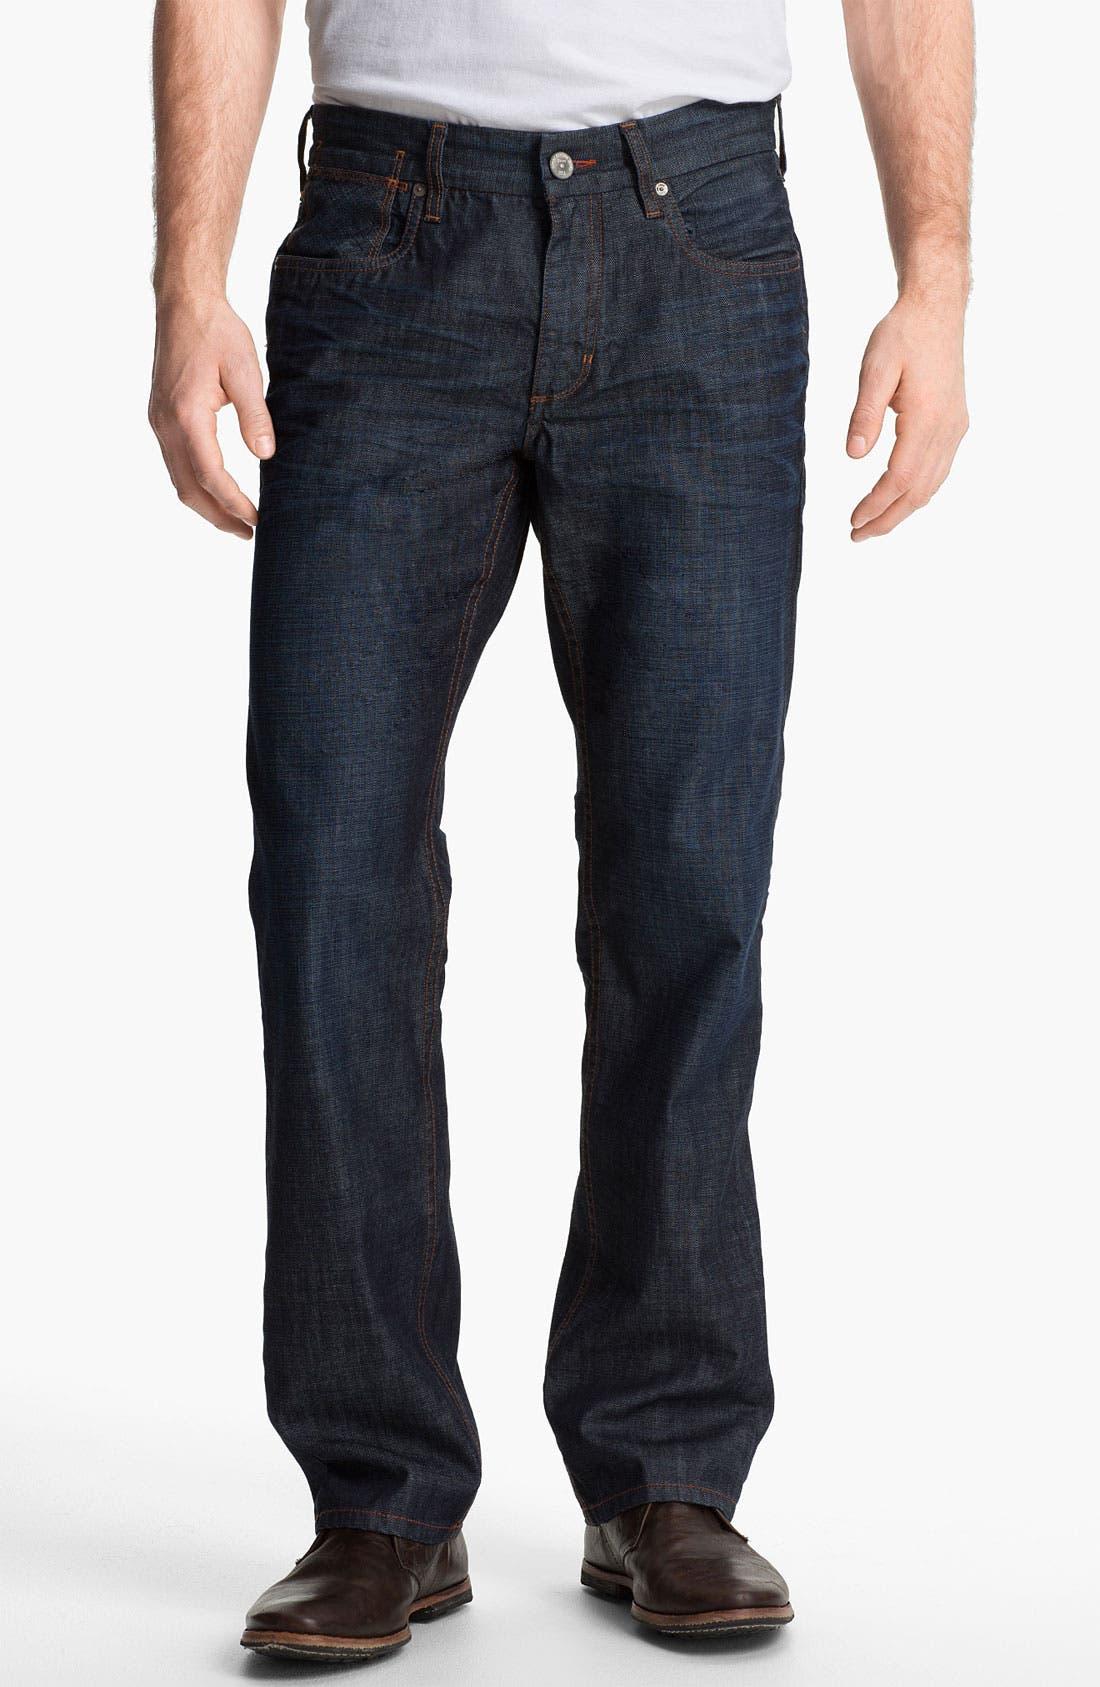 Main Image - Tommy Bahama Denim 'Cruz' Authentic Fit Jeans (Vintage Dark)